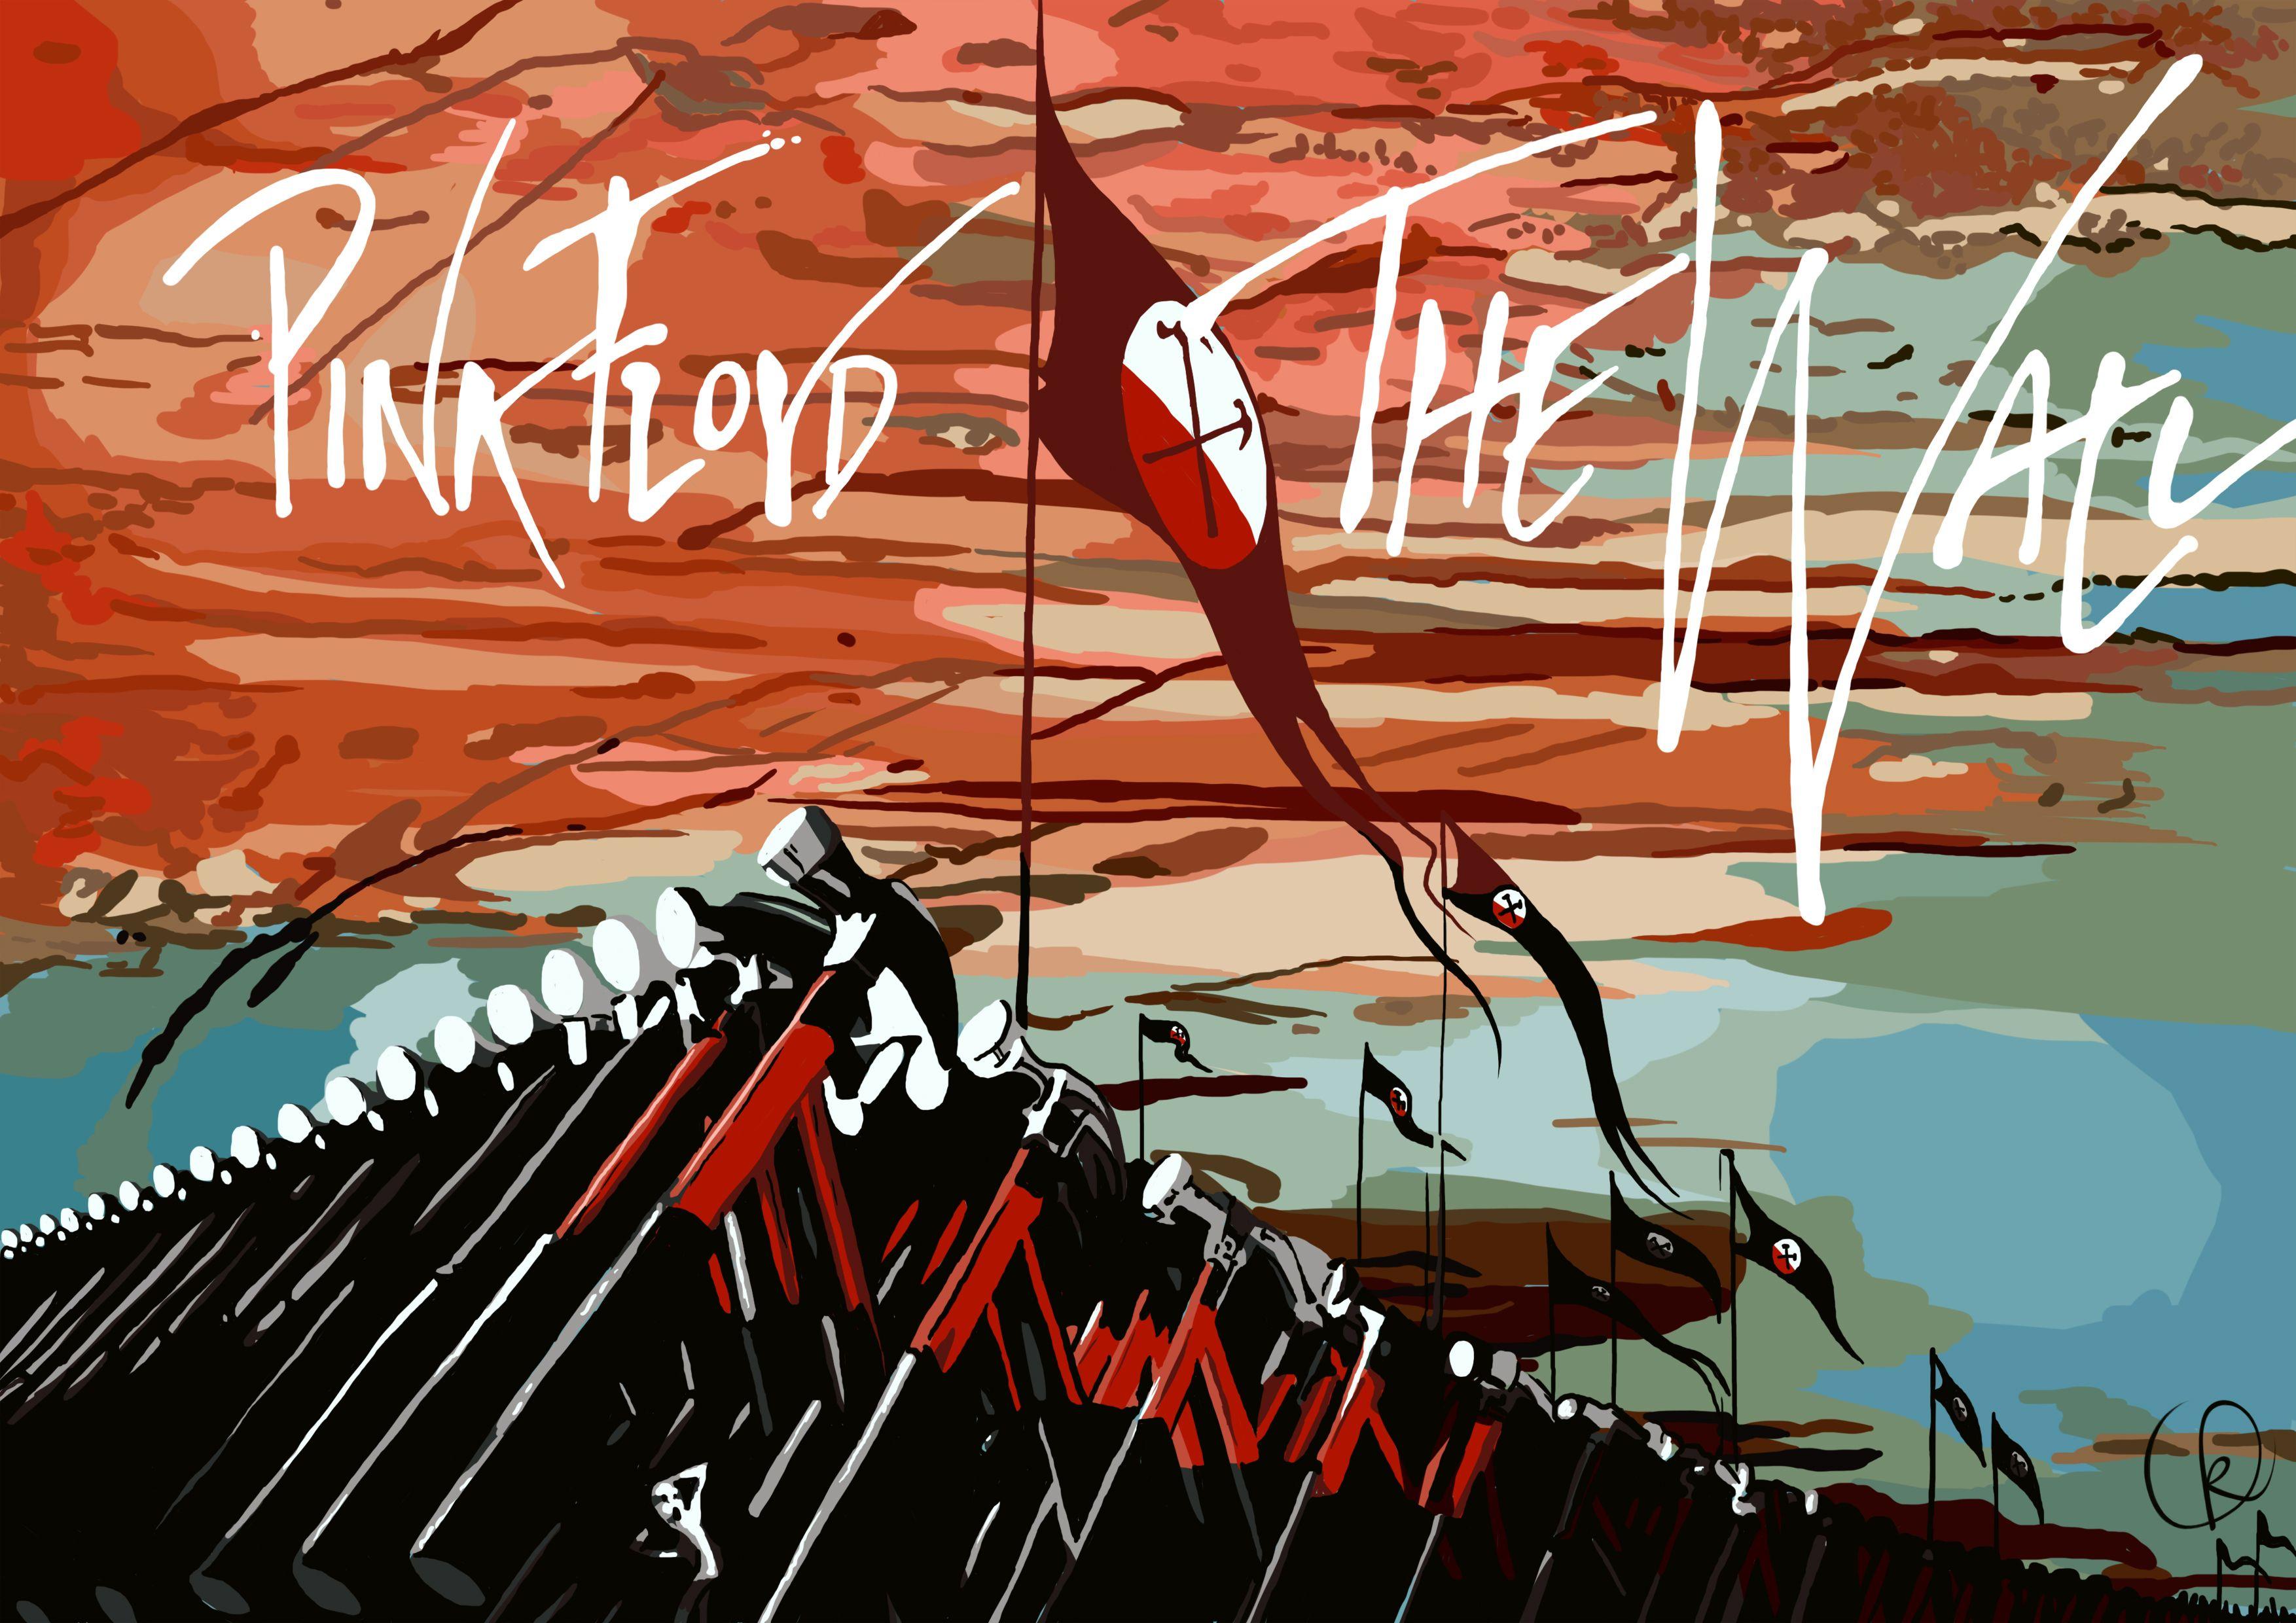 Pink Floyd Wallpaper The Wall Hammer Pink Wall Hammers Rock